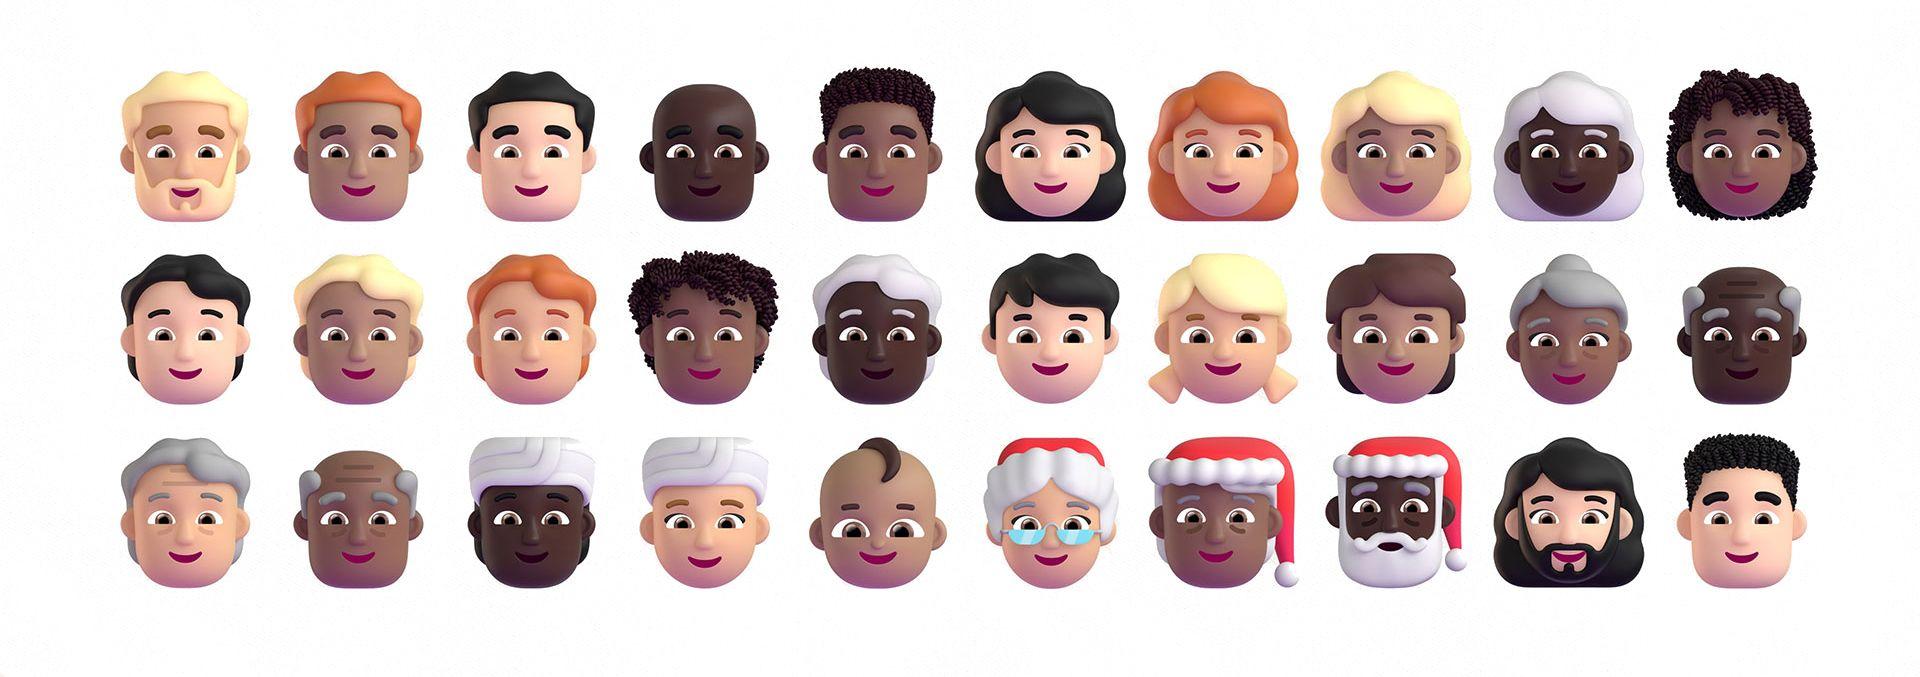 Emojipedia-Windows-11-Fluent-People-Skin-Tone-Versions